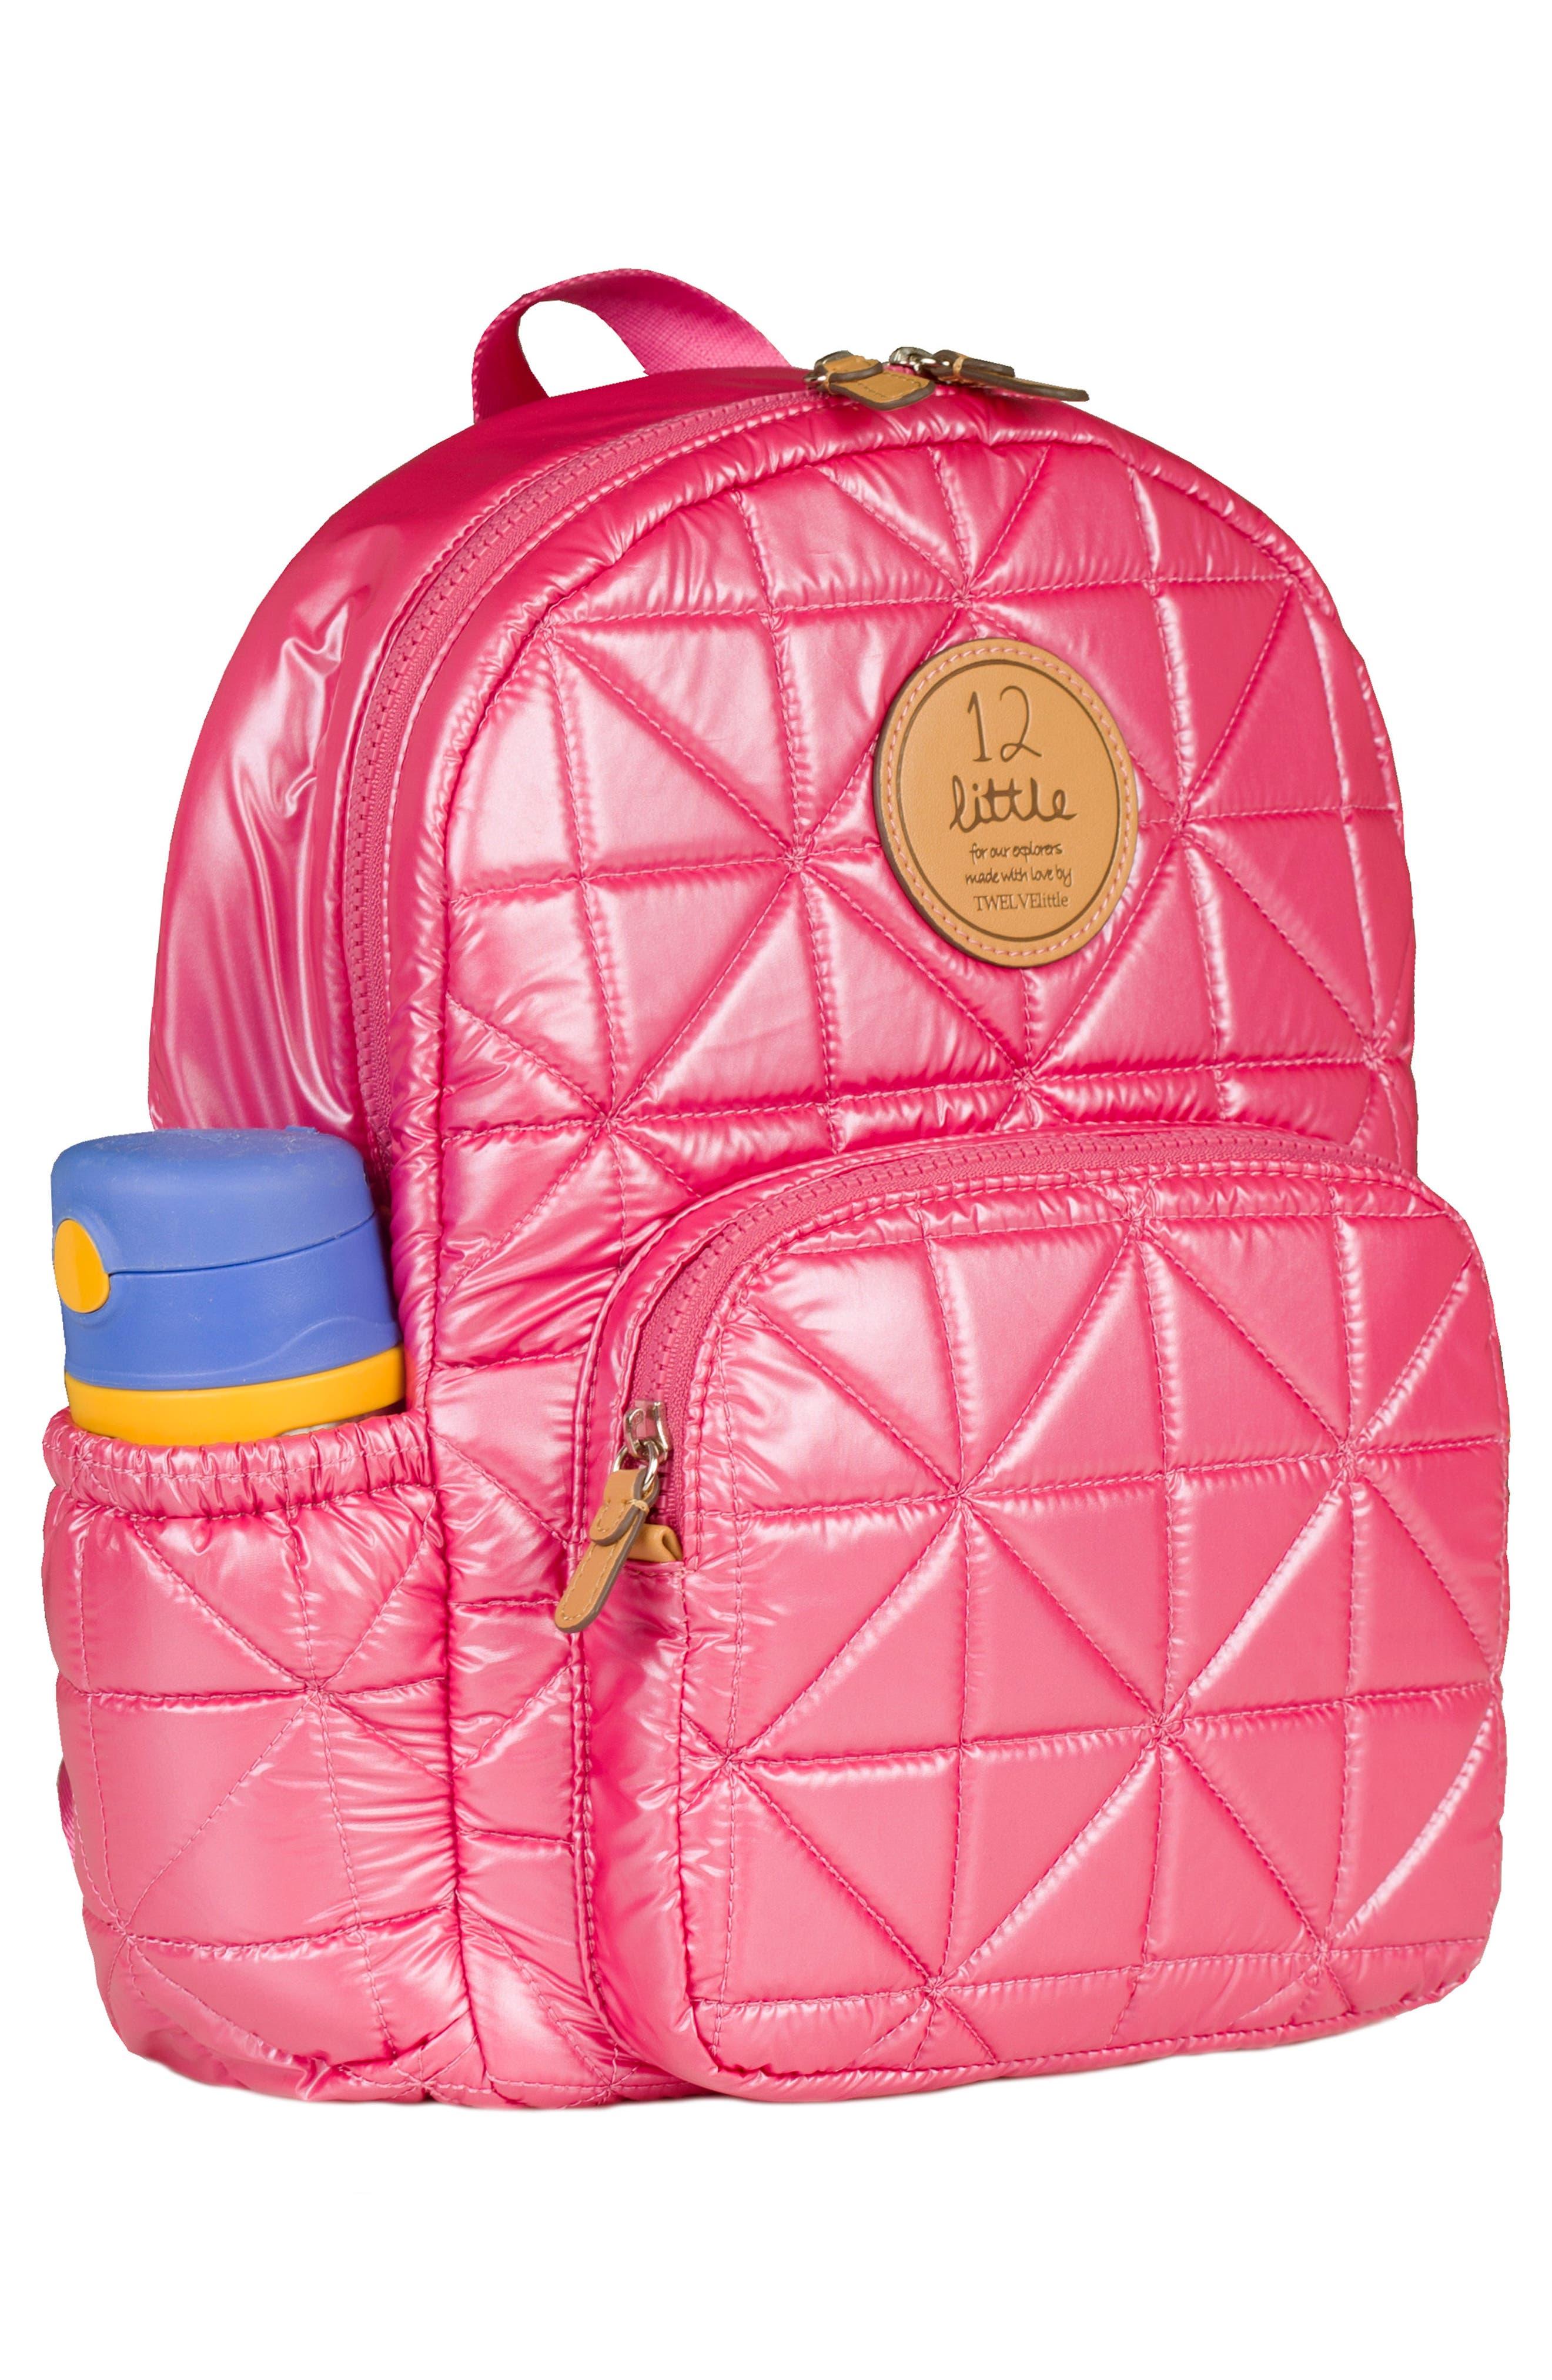 Little Companion Backpack,                             Alternate thumbnail 3, color,                             PINK